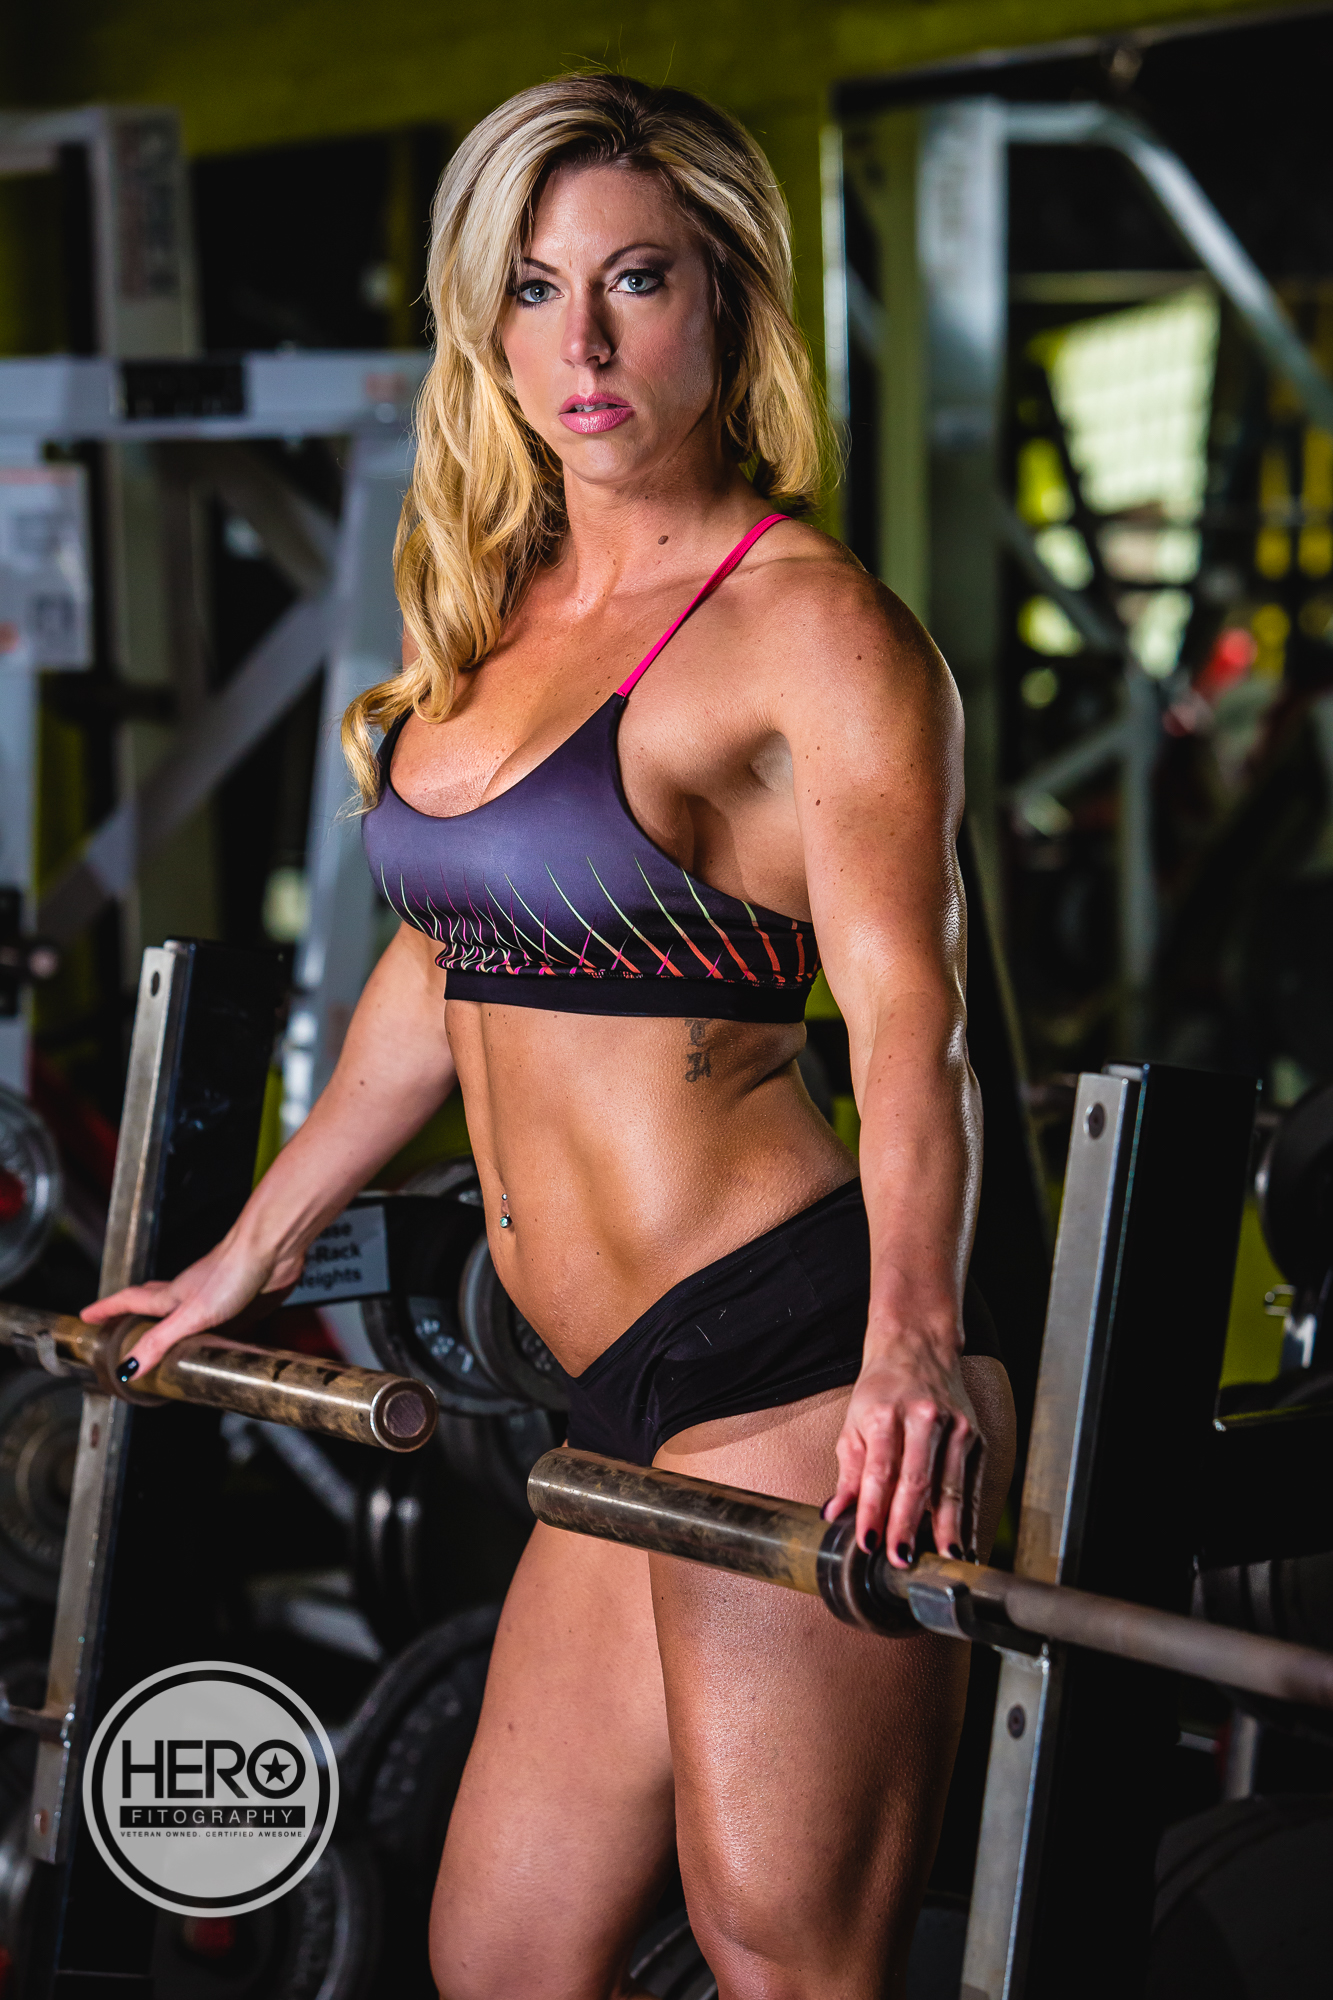 SaraLynn Fitness-4588.jpg